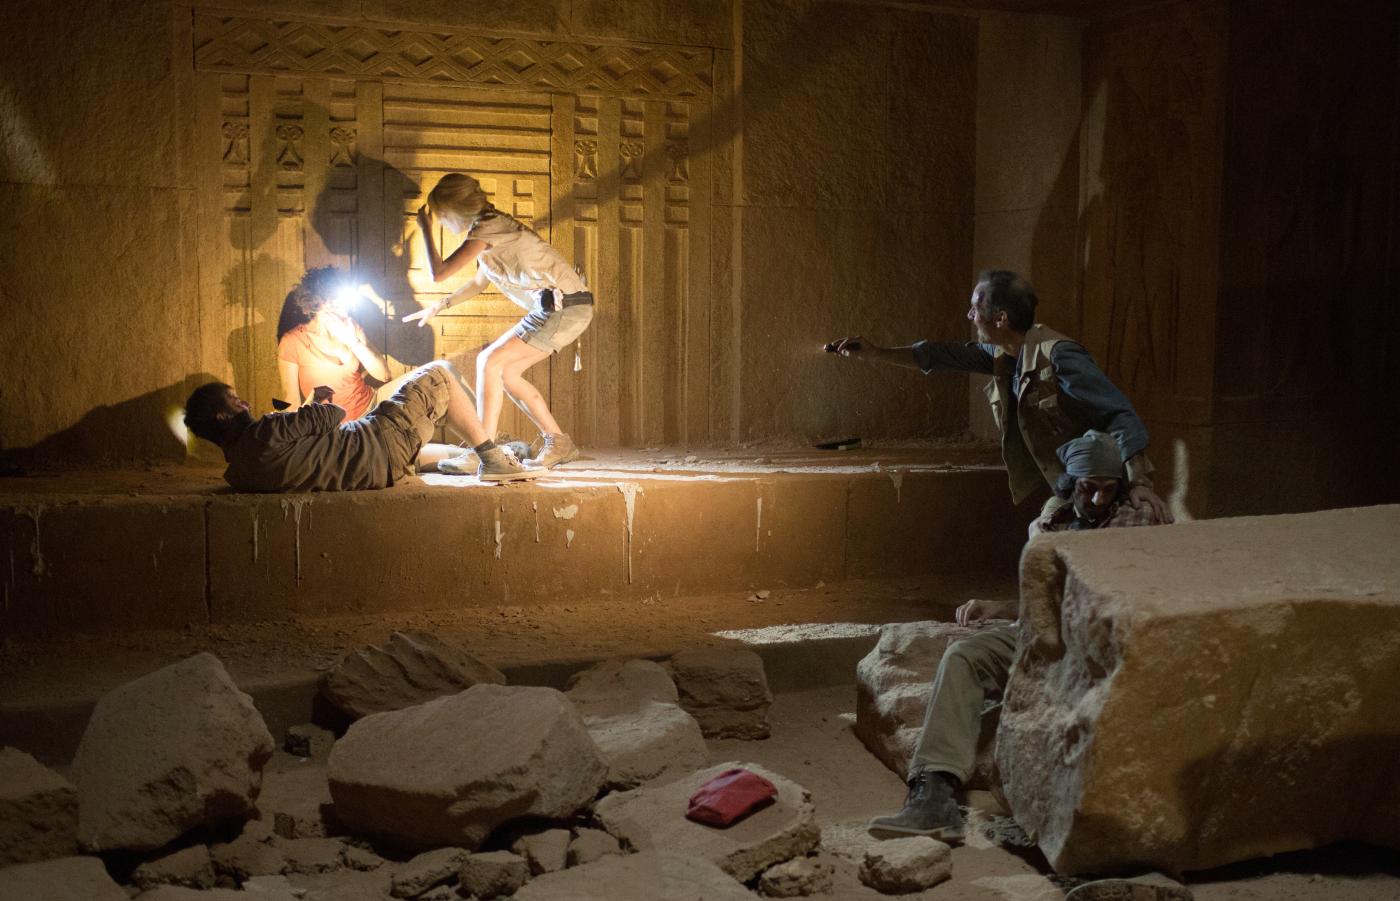 Pyramide-Film-Image-3